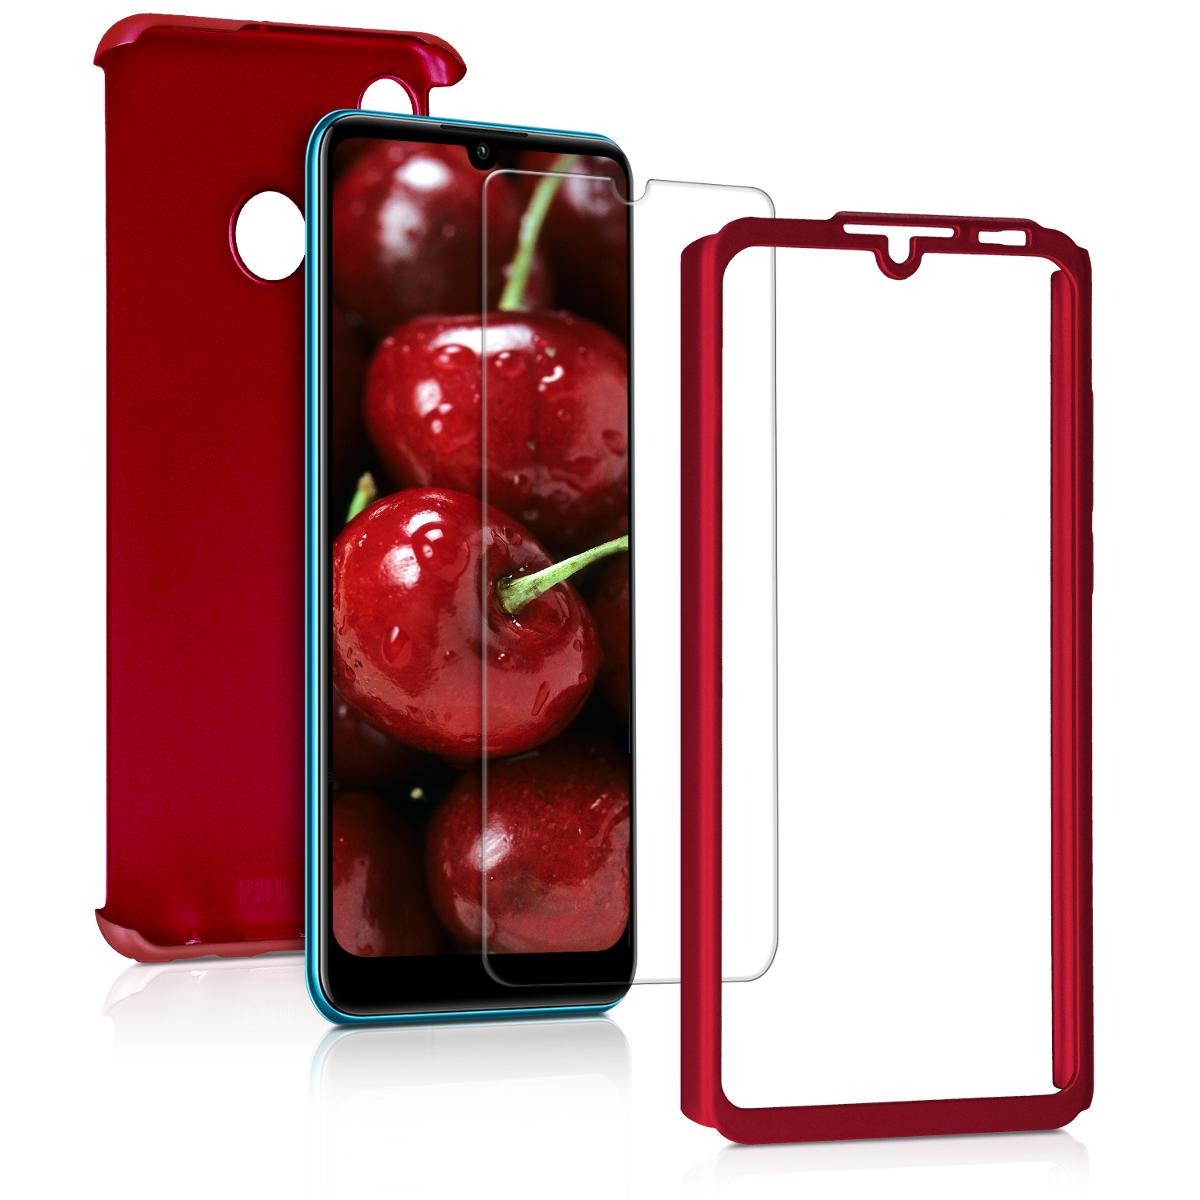 KW Θήκη Full Body Huawei P30 Lite & Tempered Glass - Metallic Dark Red (47508.36)